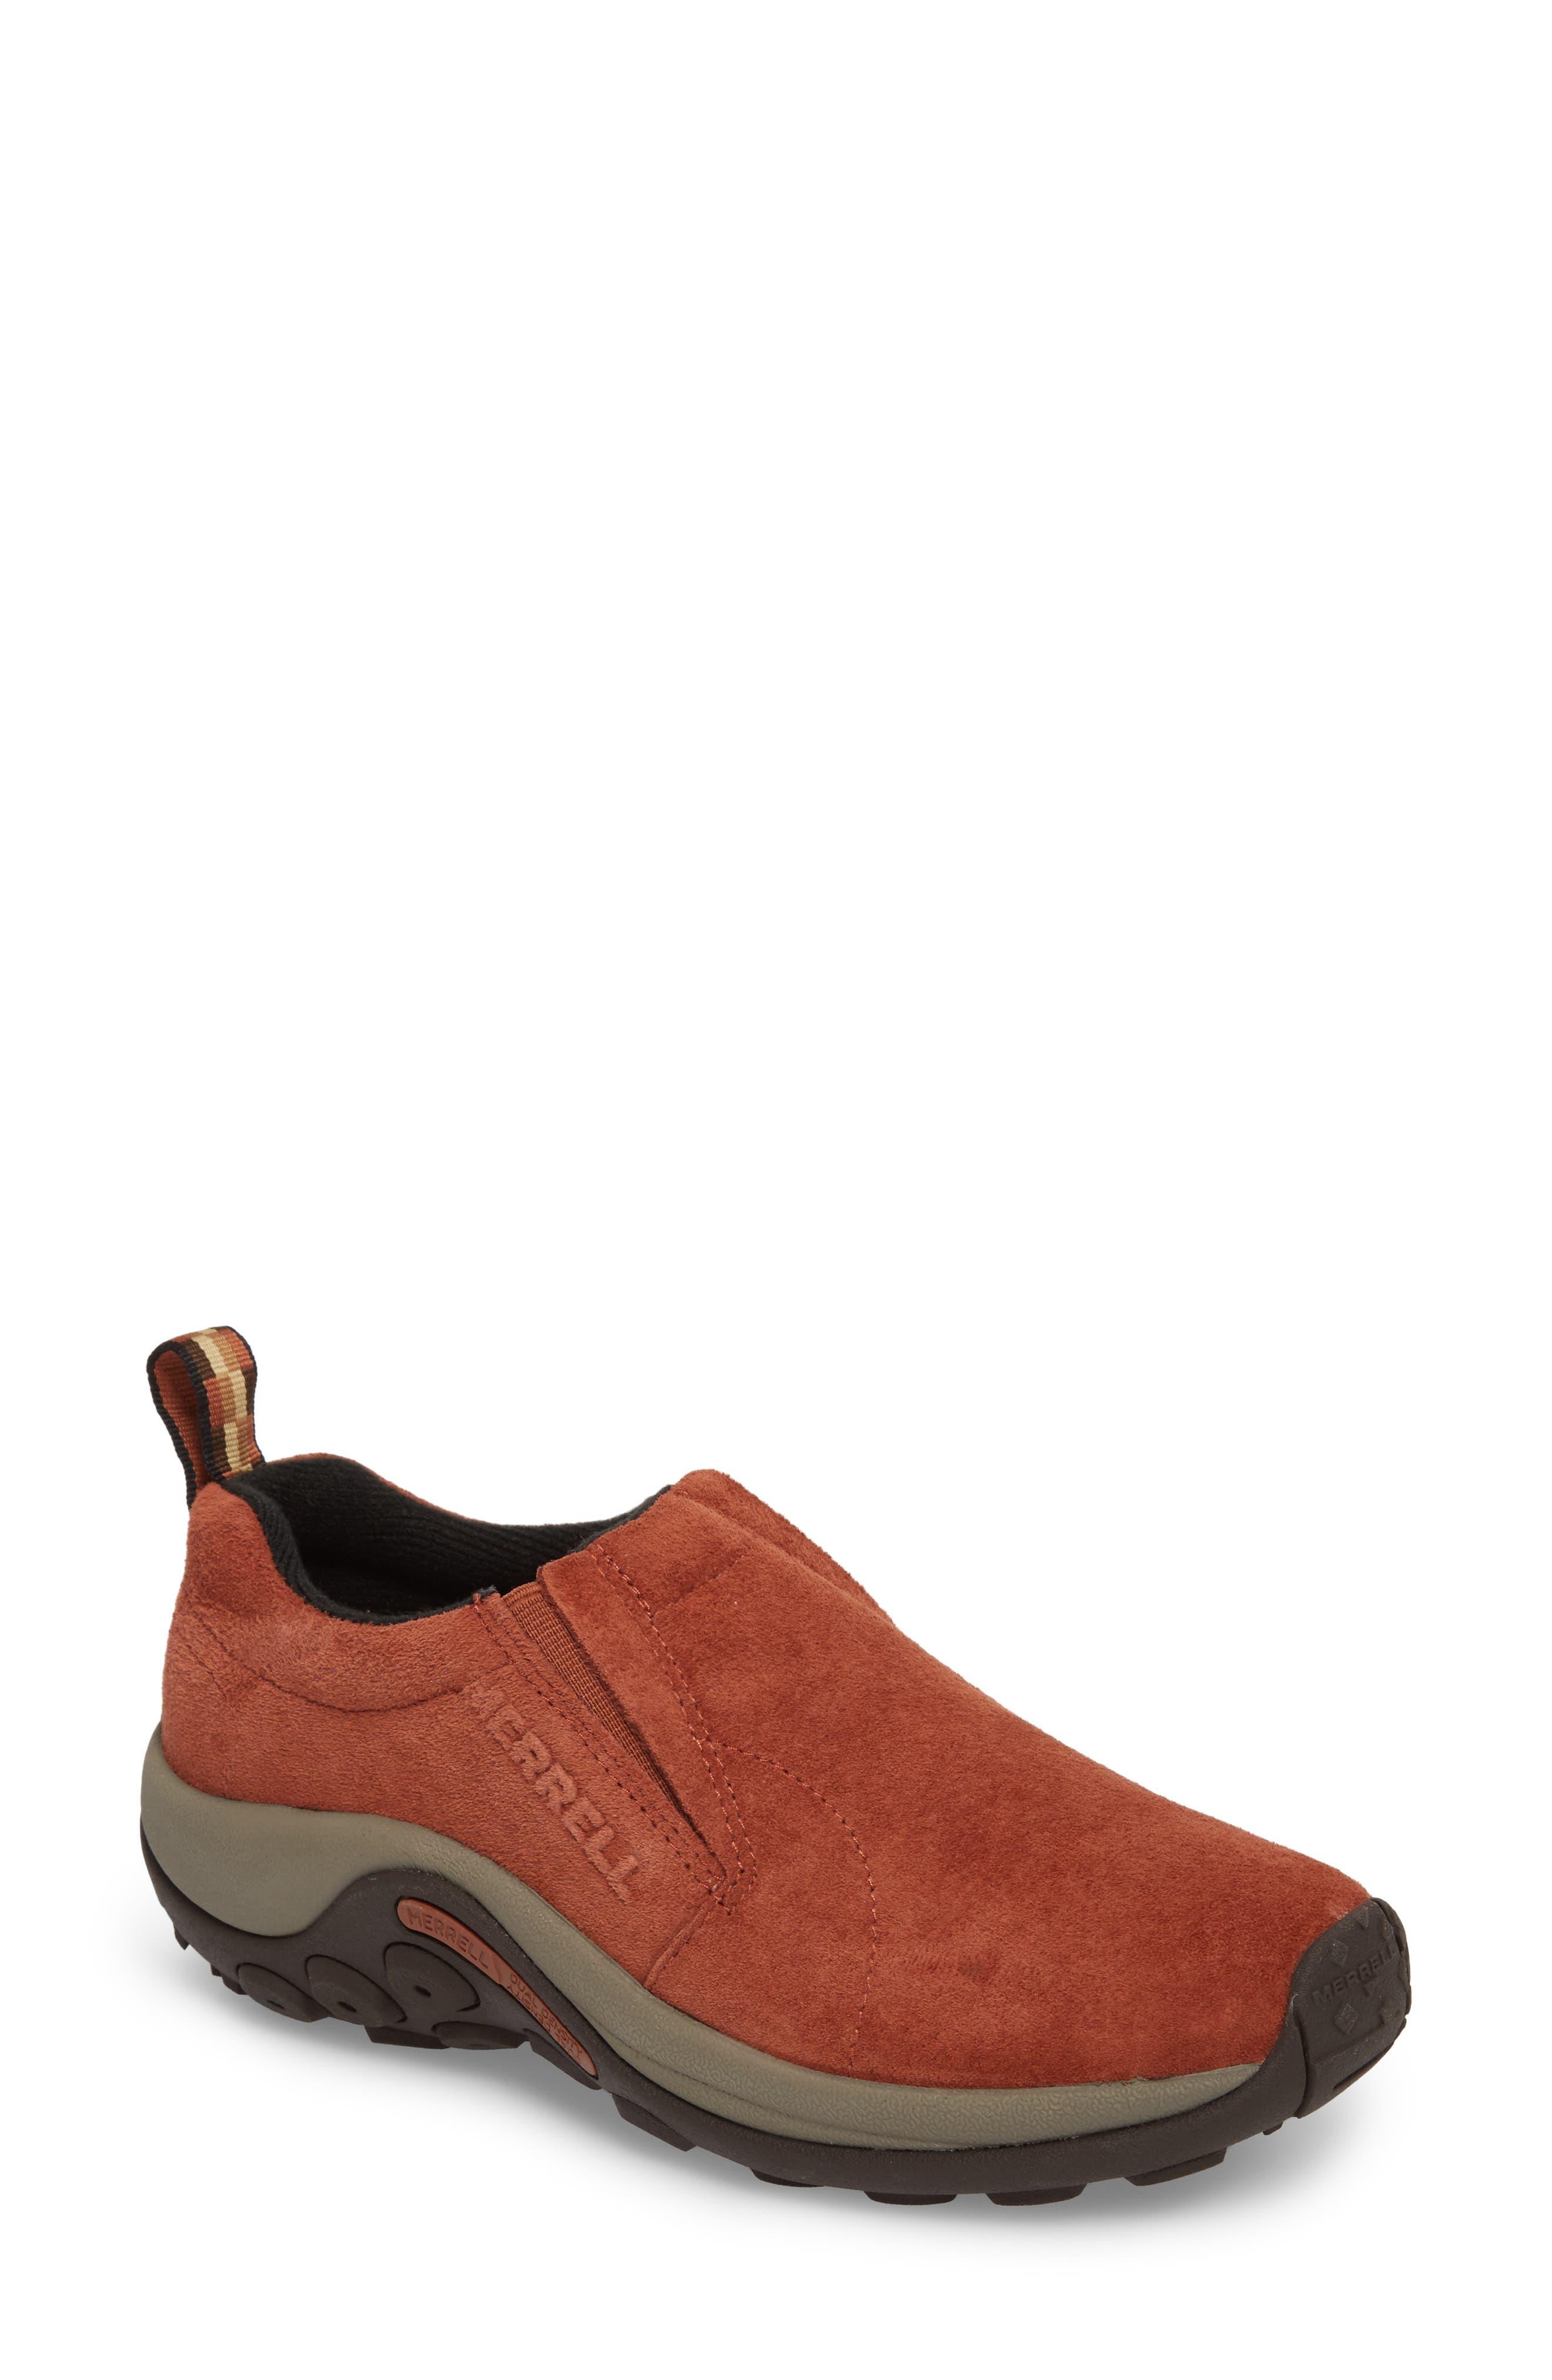 Alternate Image 1 Selected - Merrell Jungle Moc Sneaker (Women)